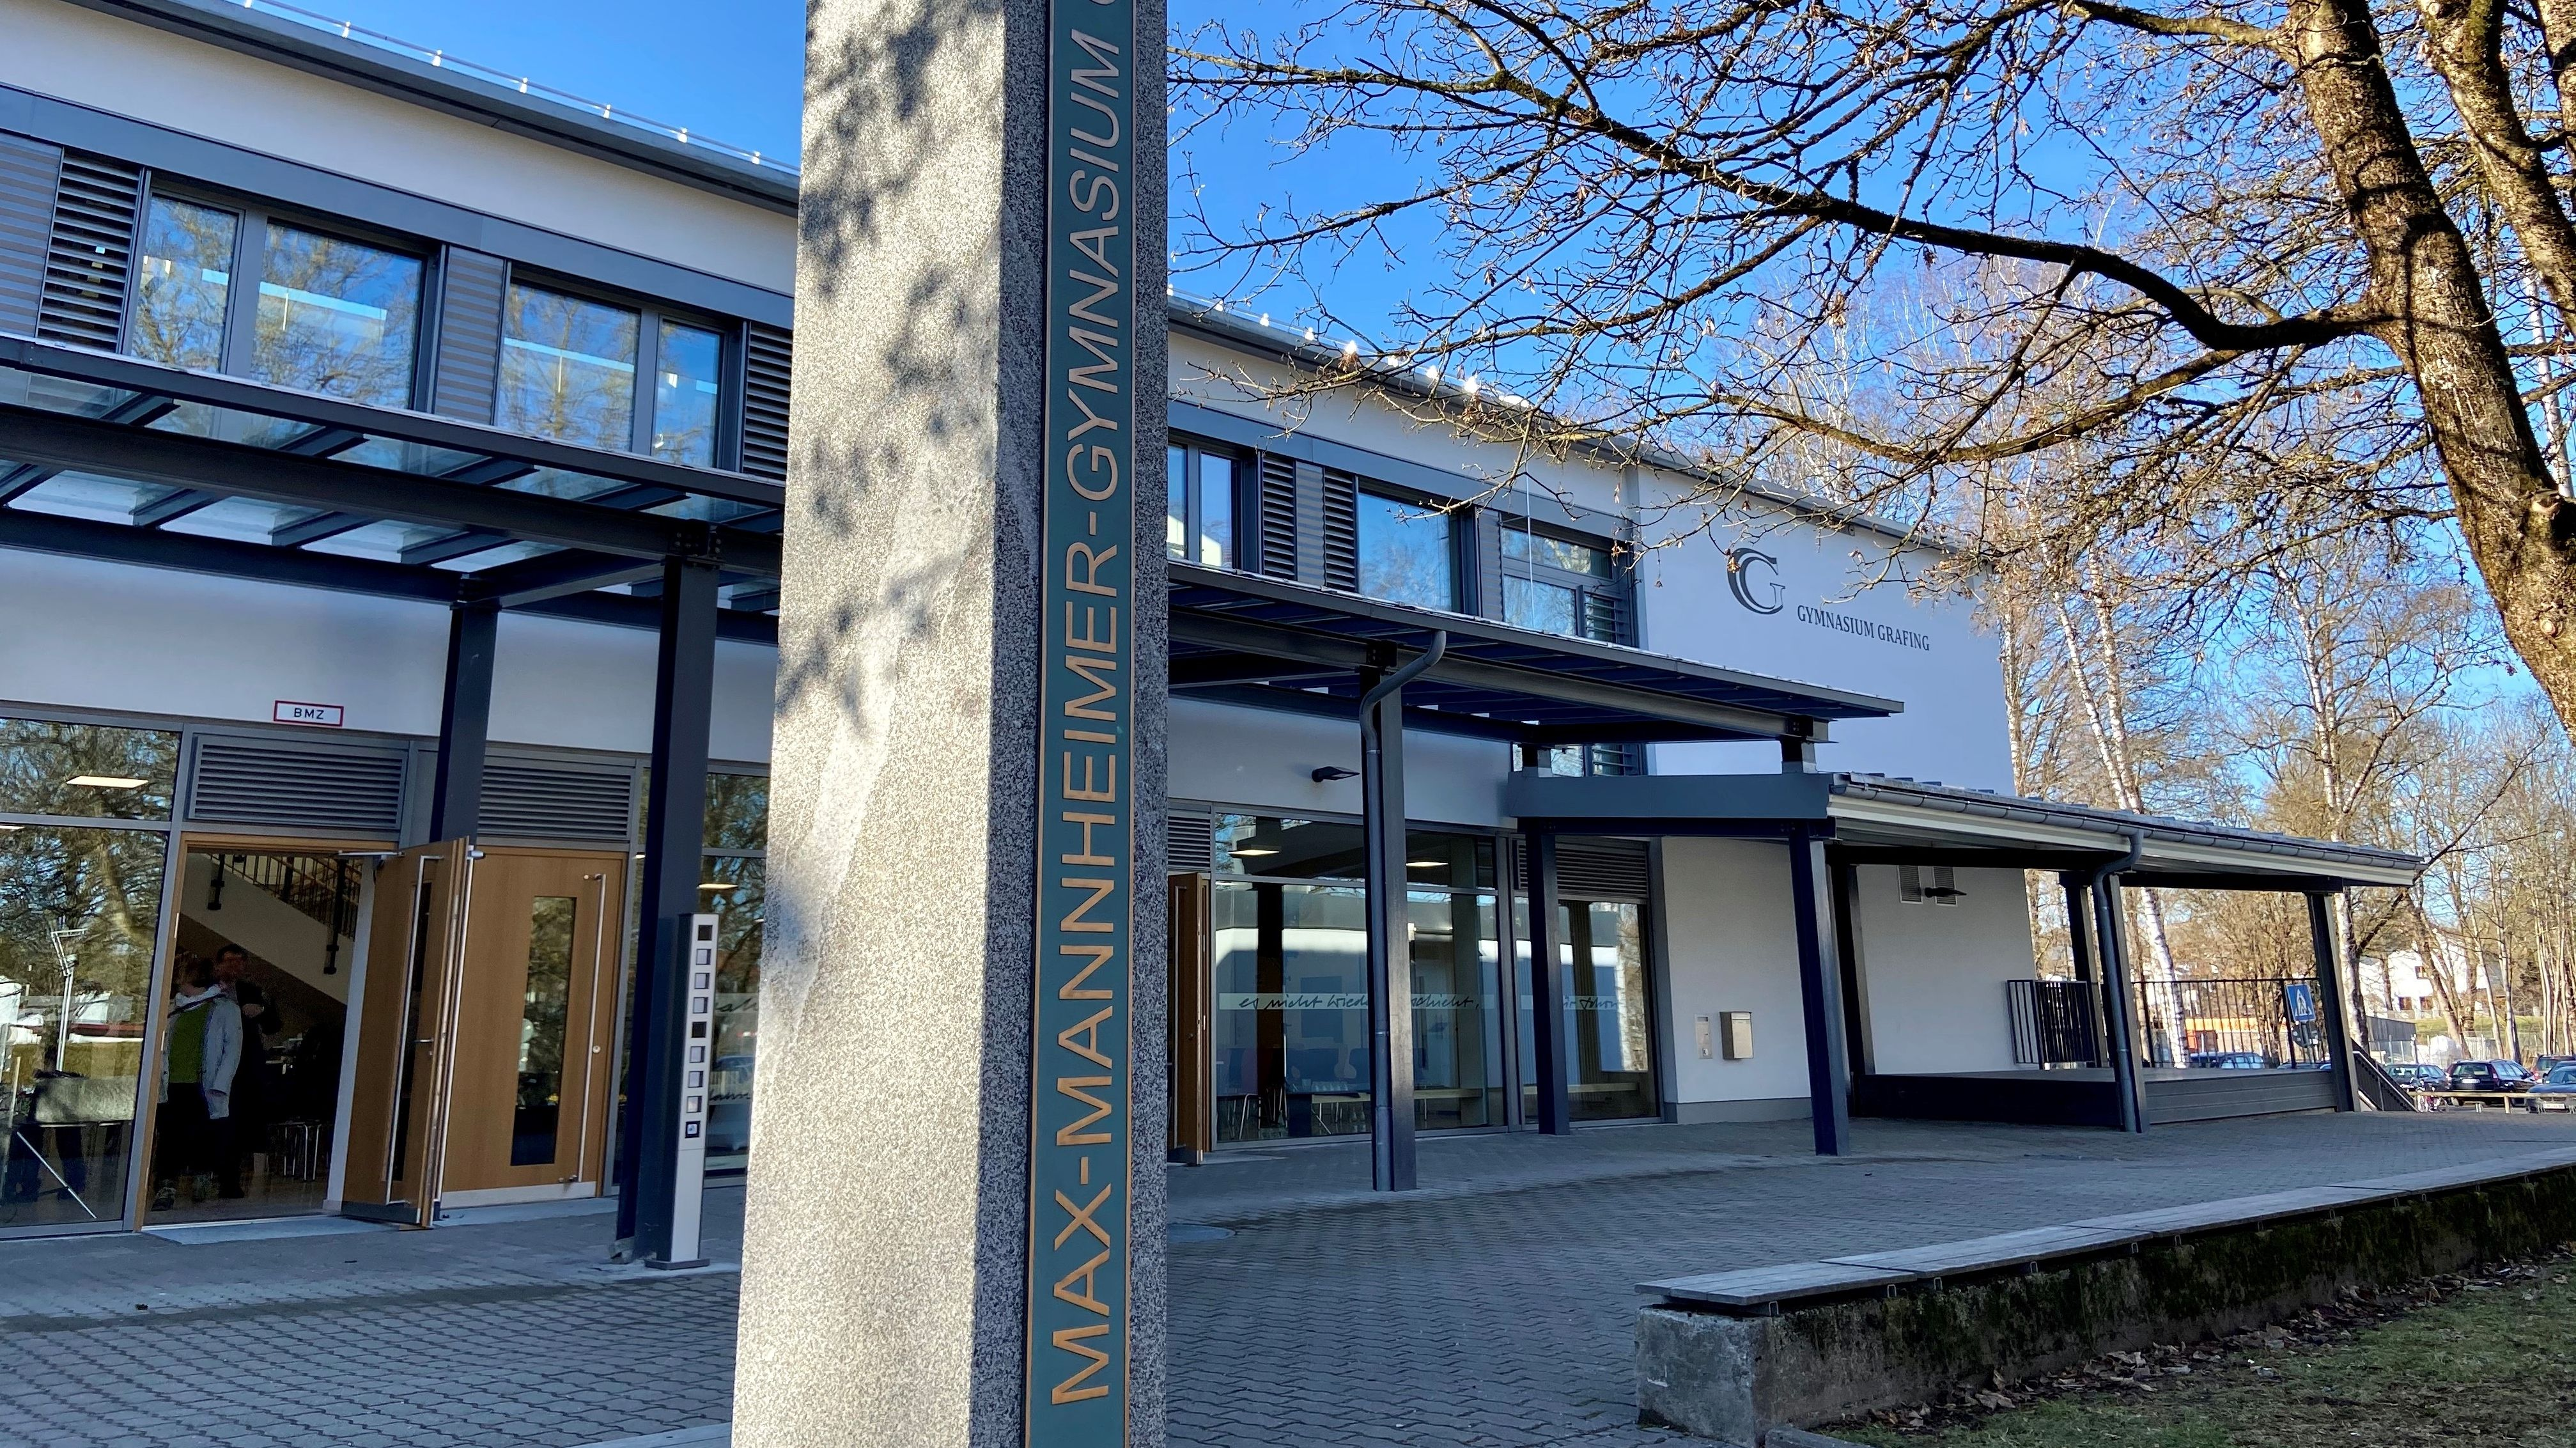 Gymnasium Grafing heißt jetzt Max -Mannheimer Gymnasium